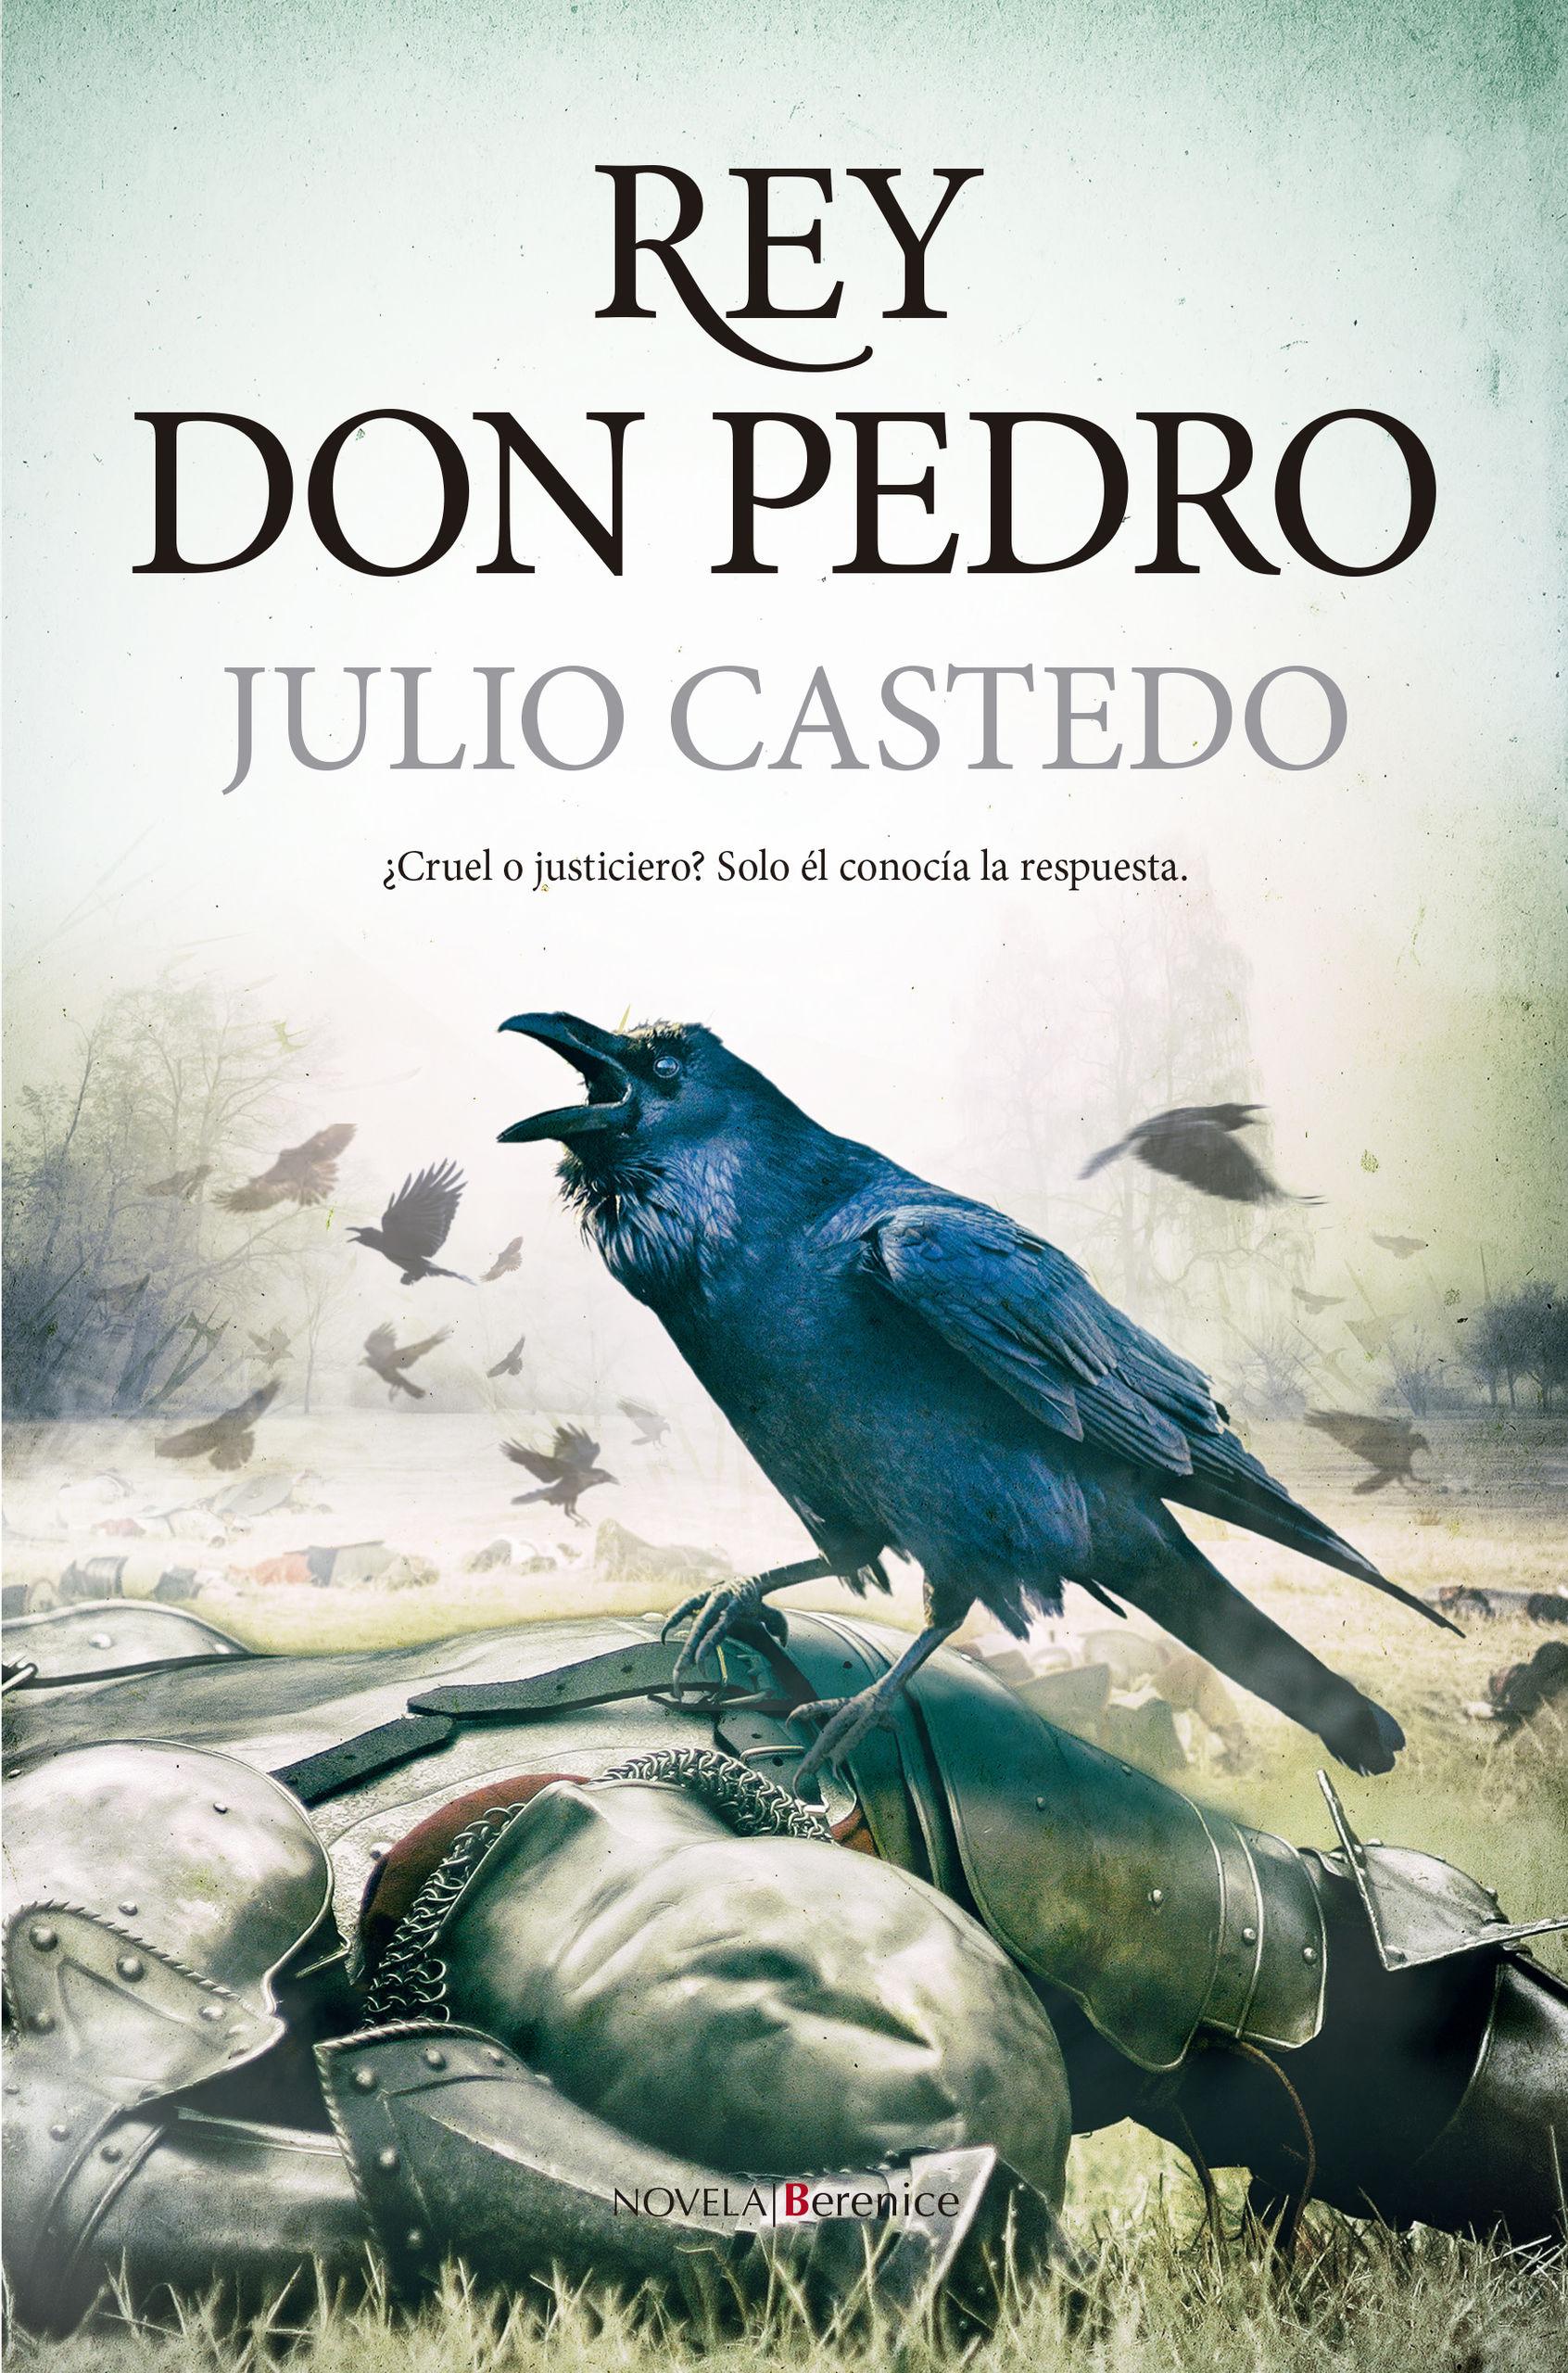 don-pedro-rey-portada.jpg